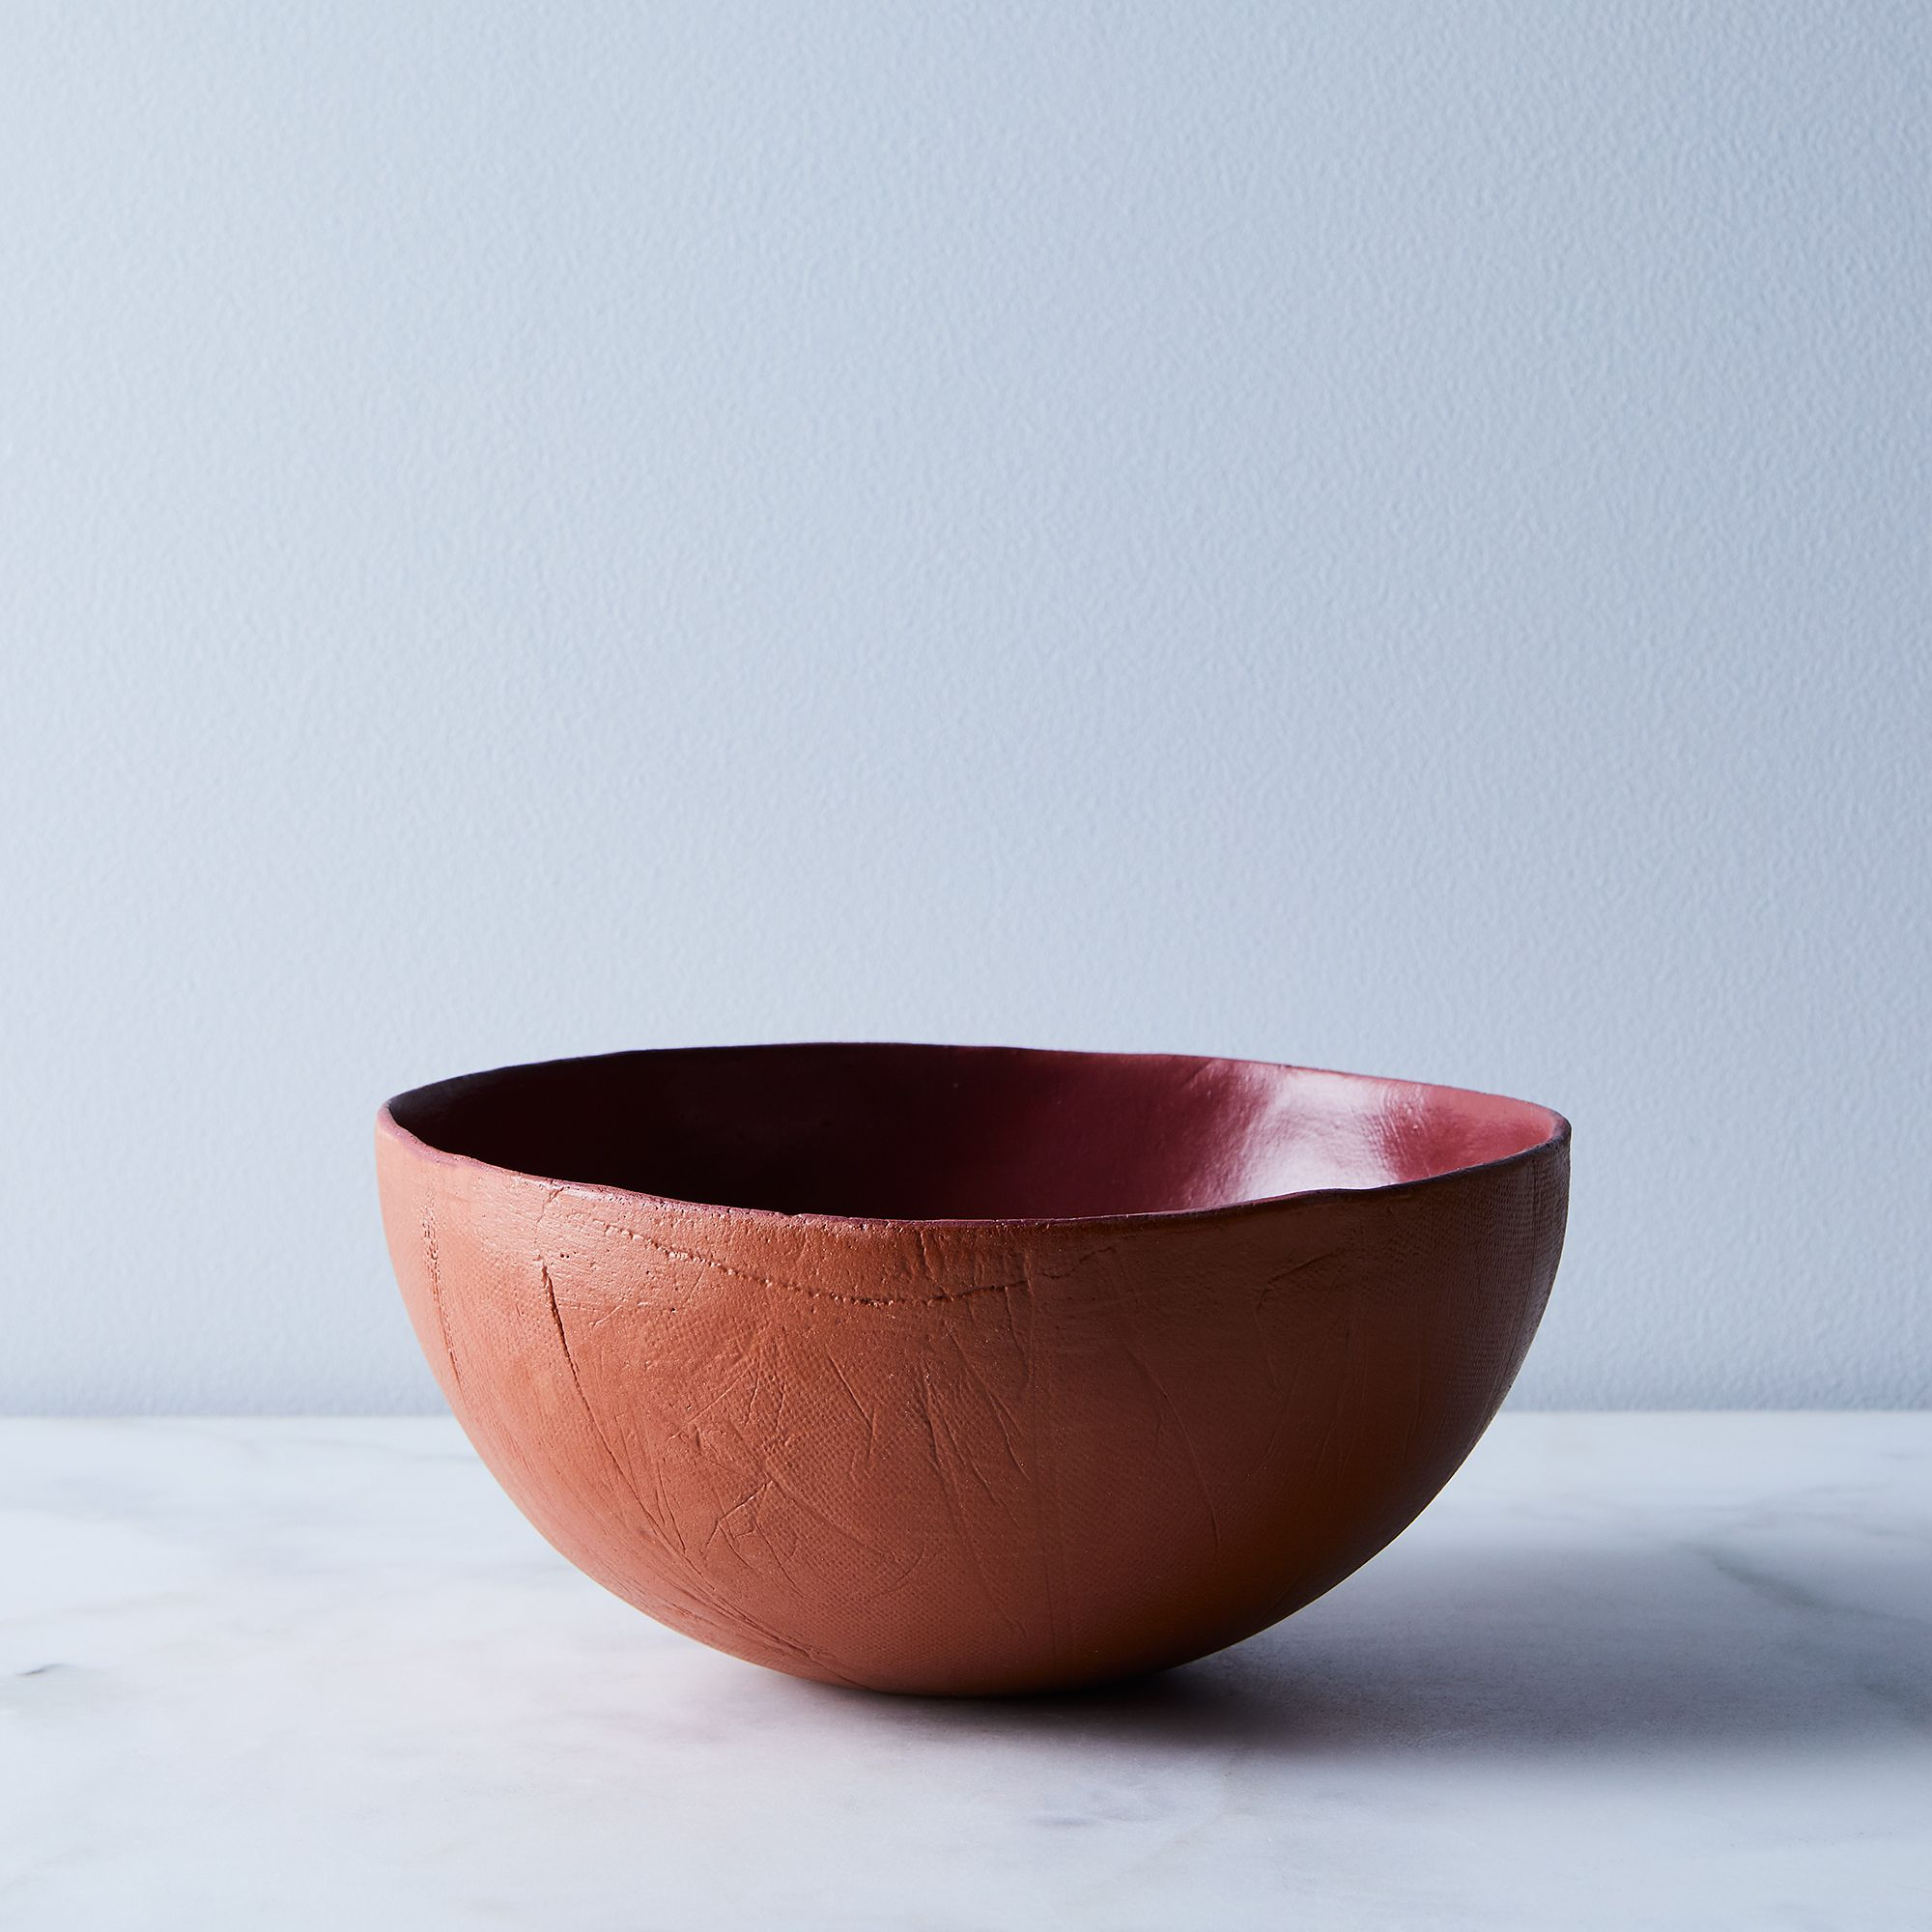 F2ce29f4 313e 421a bf4b 6771b3f652e7  2017 0929 sin food52 featherweight dinnerware deep bowl terracotta silo ty mecham 004